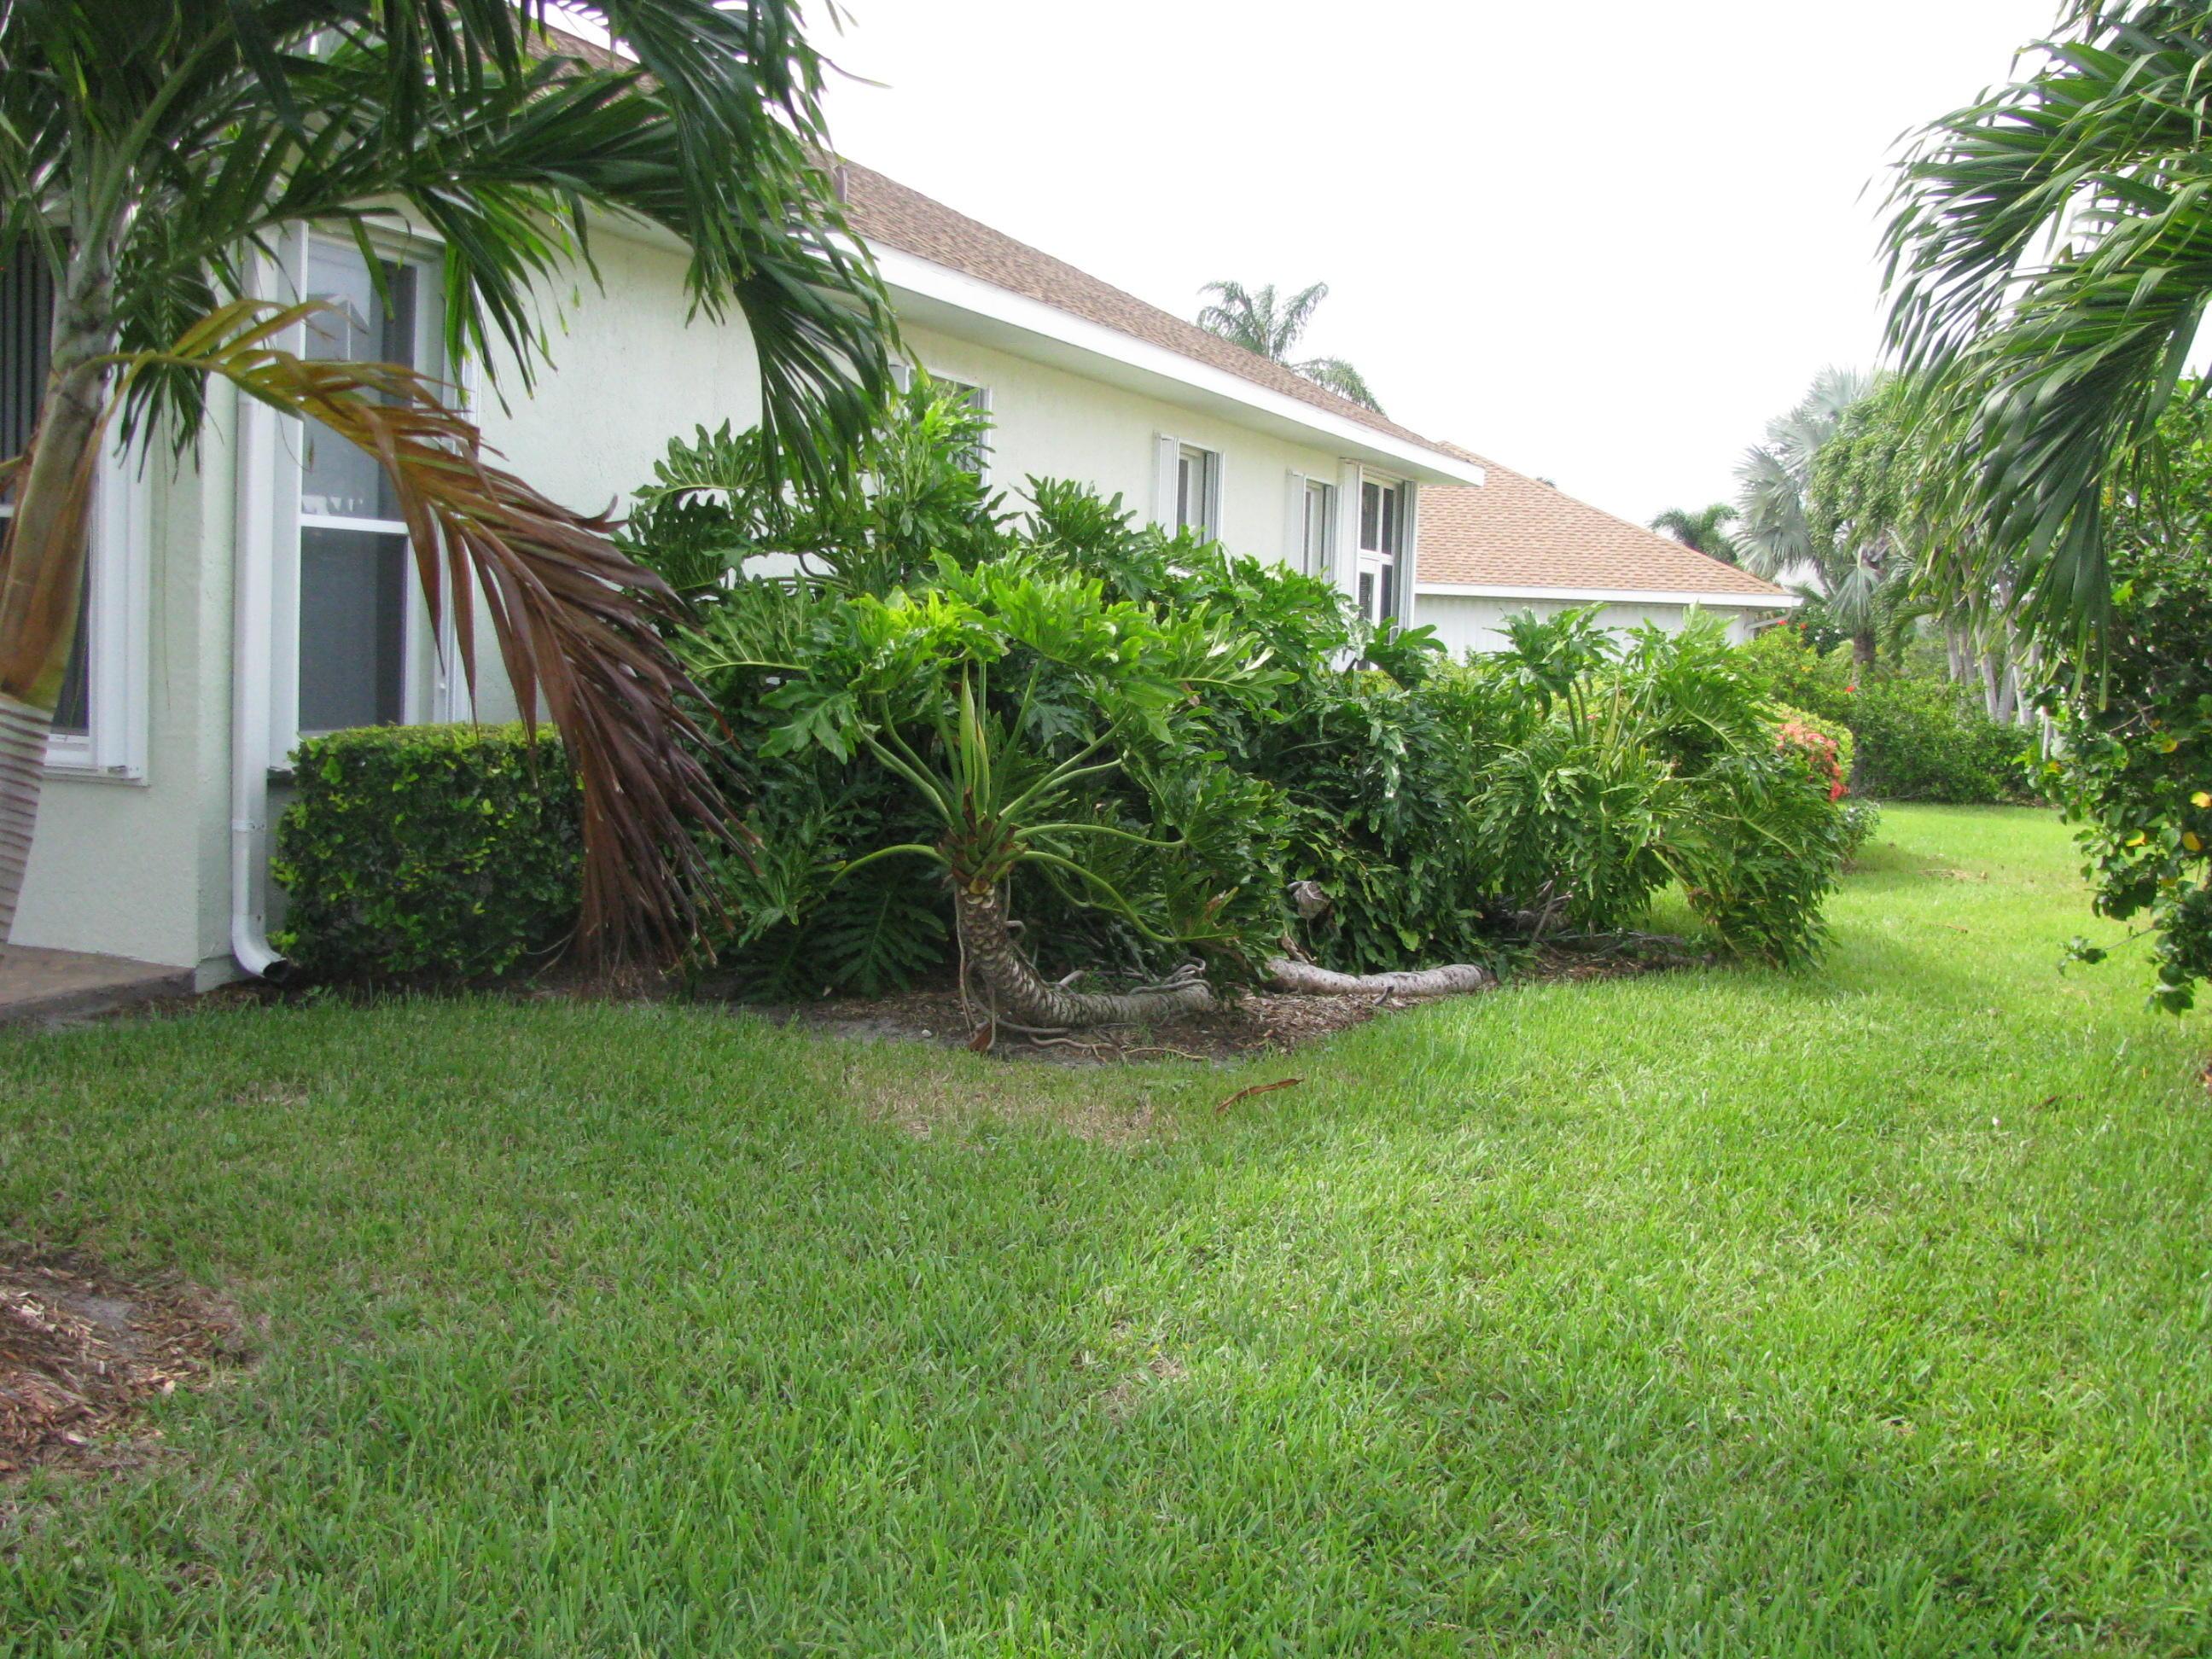 3017 Ocelot Way, Hutchinson Island, FL 34949